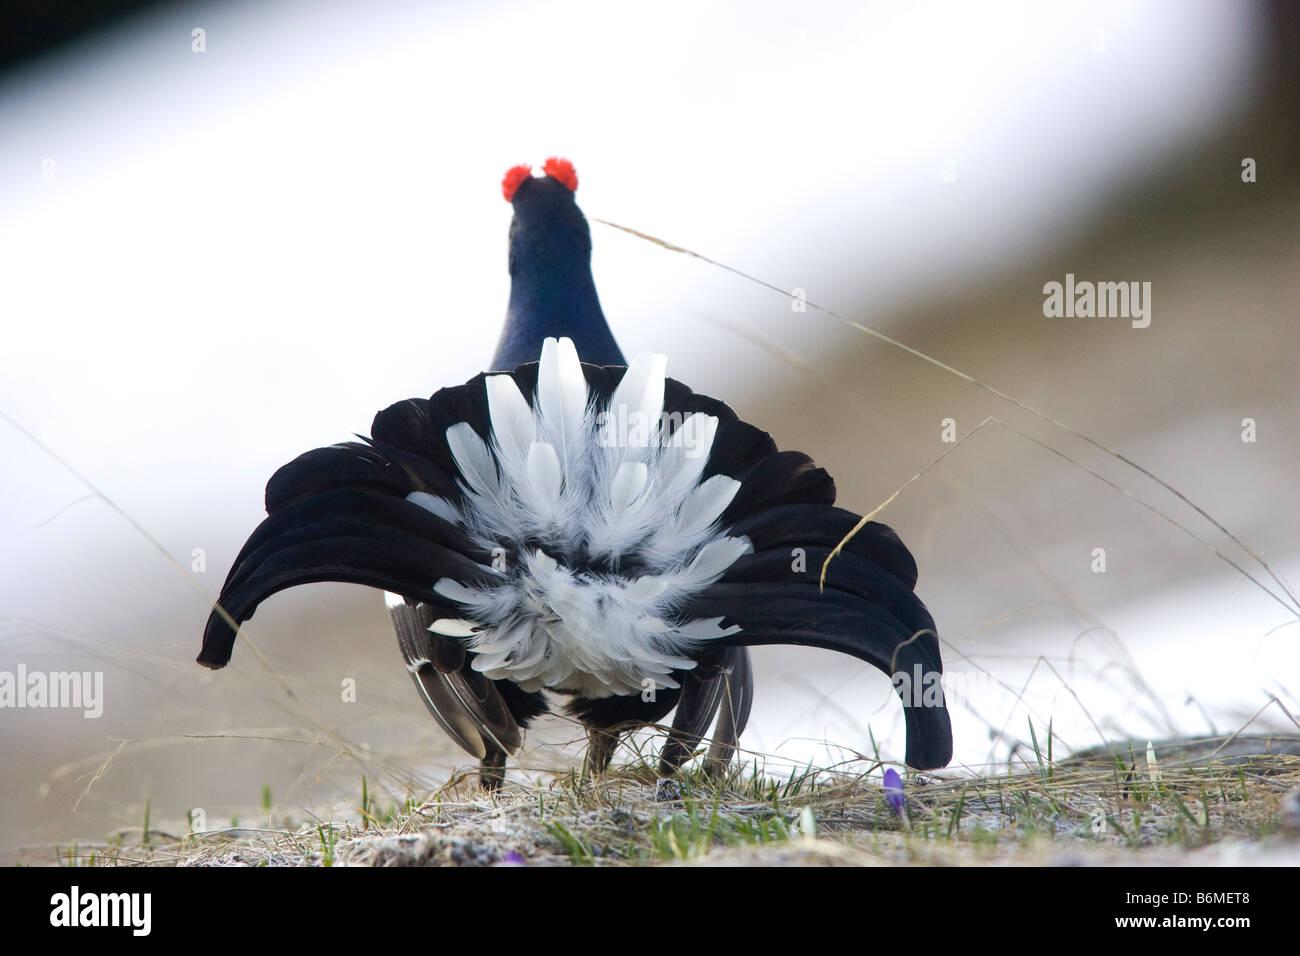 mating dance of birds. Back light - Stock Image